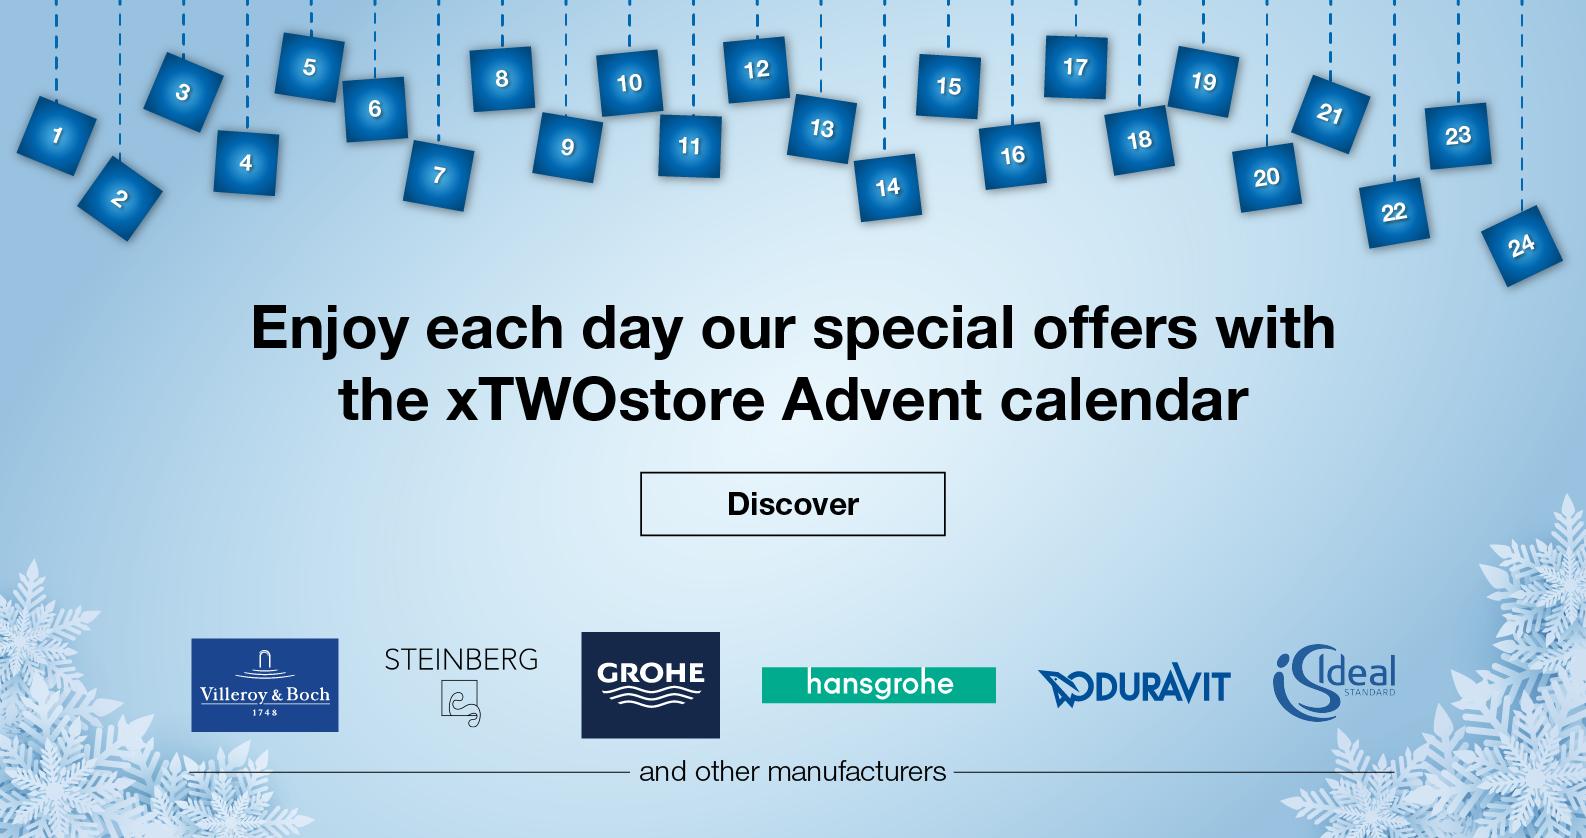 xTWOstore Advent Calendar